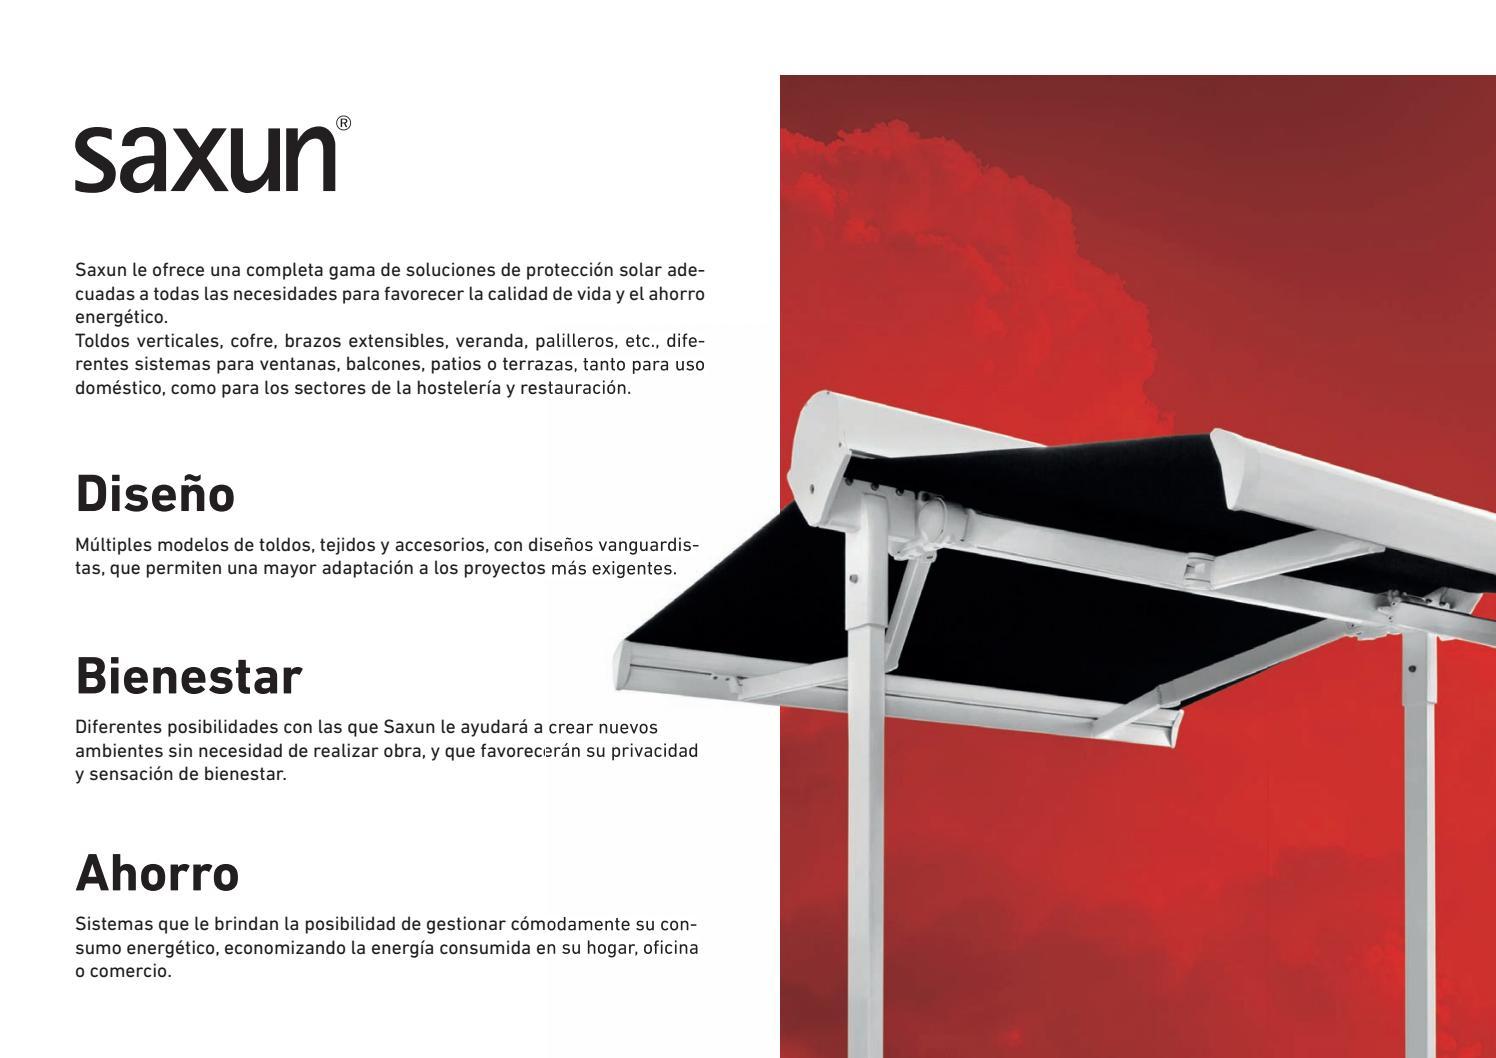 Saxun Toldos Sistema De Protección Solar Es By Gimenez